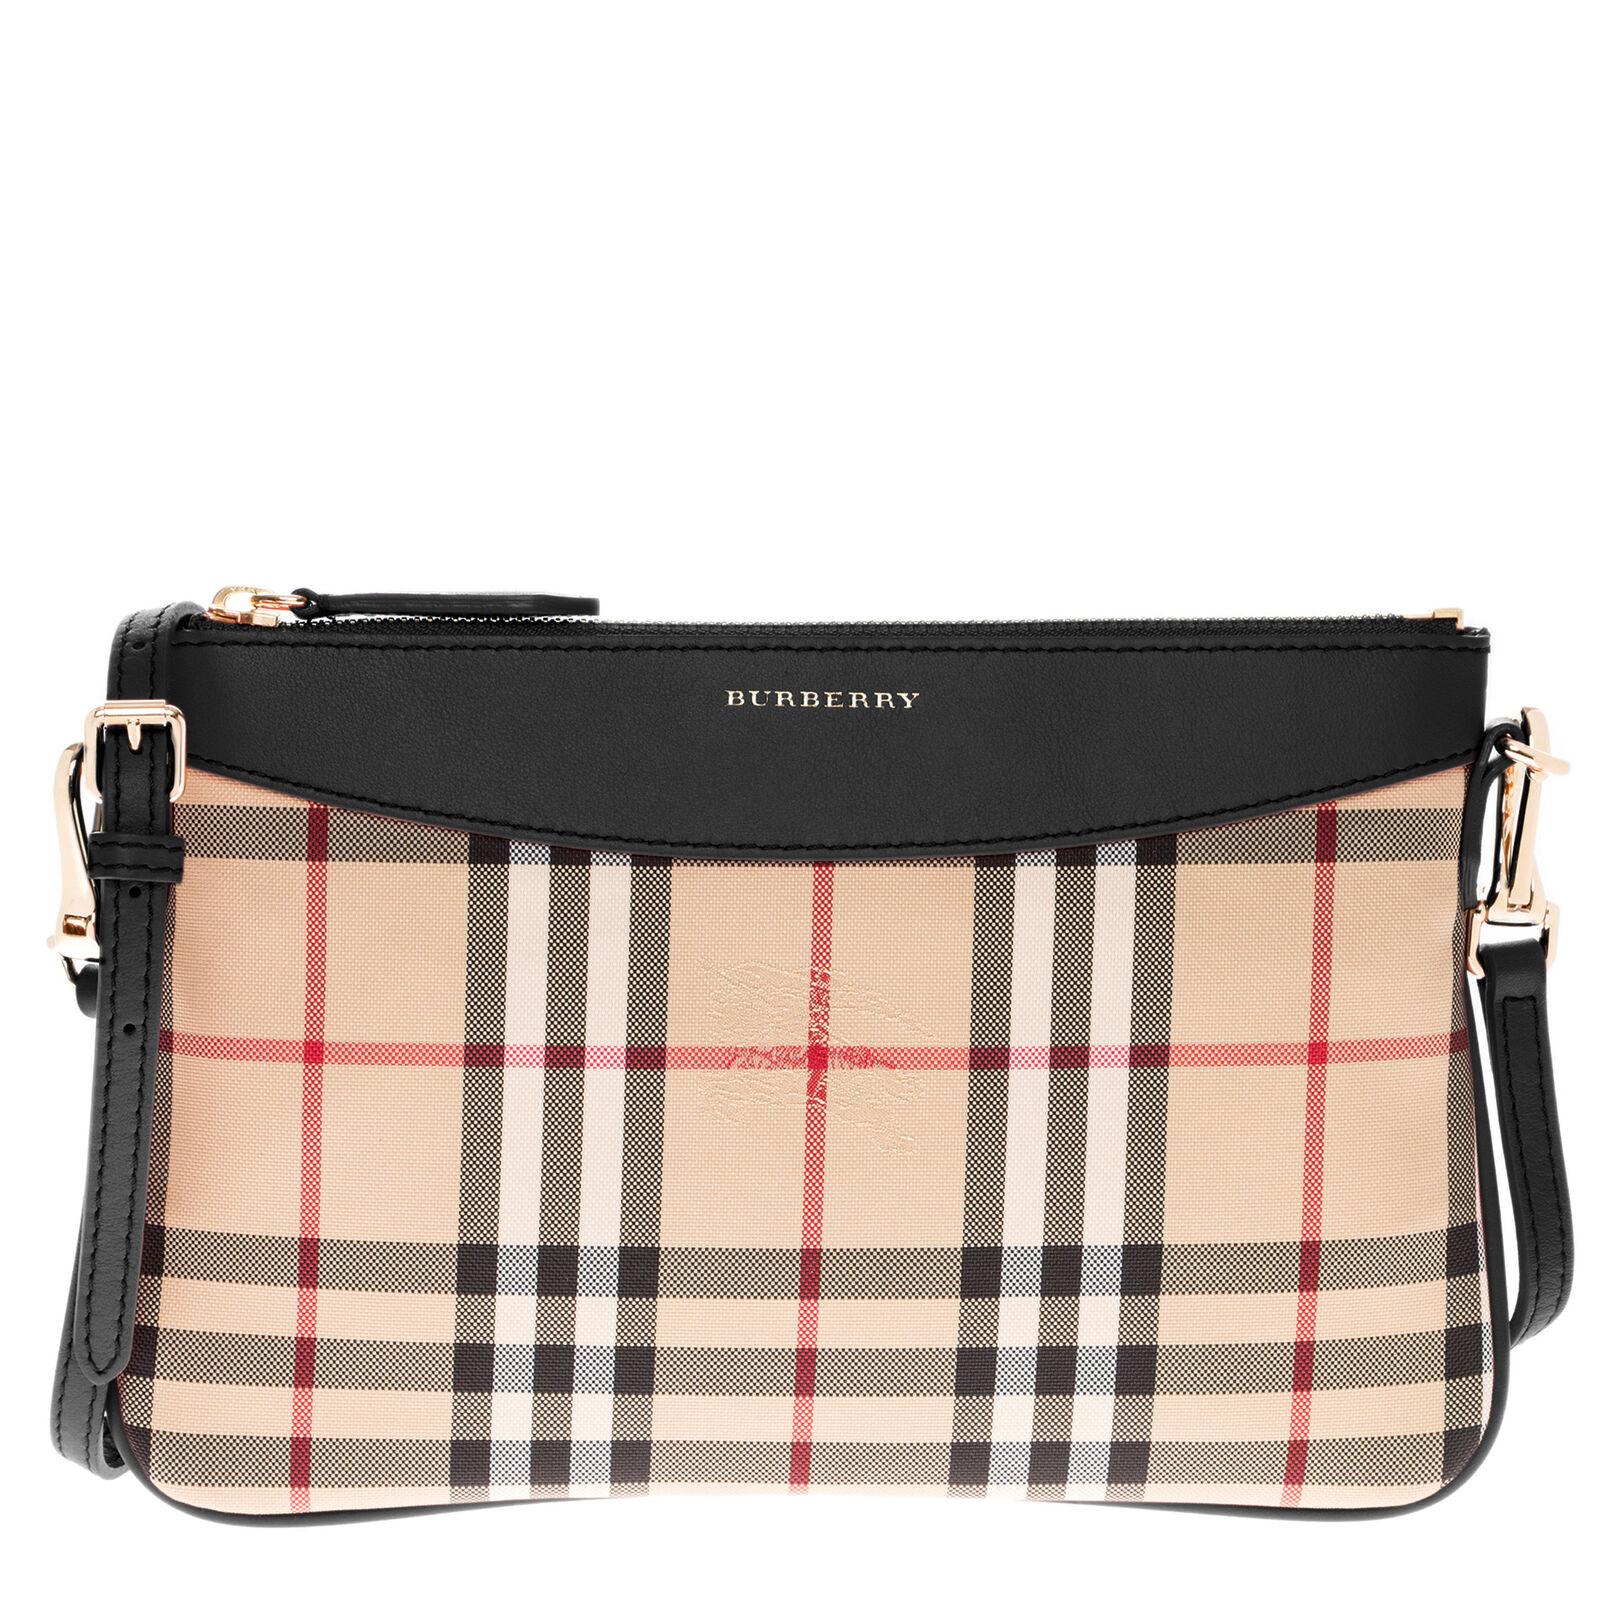 Burberry Clutch Bag Price